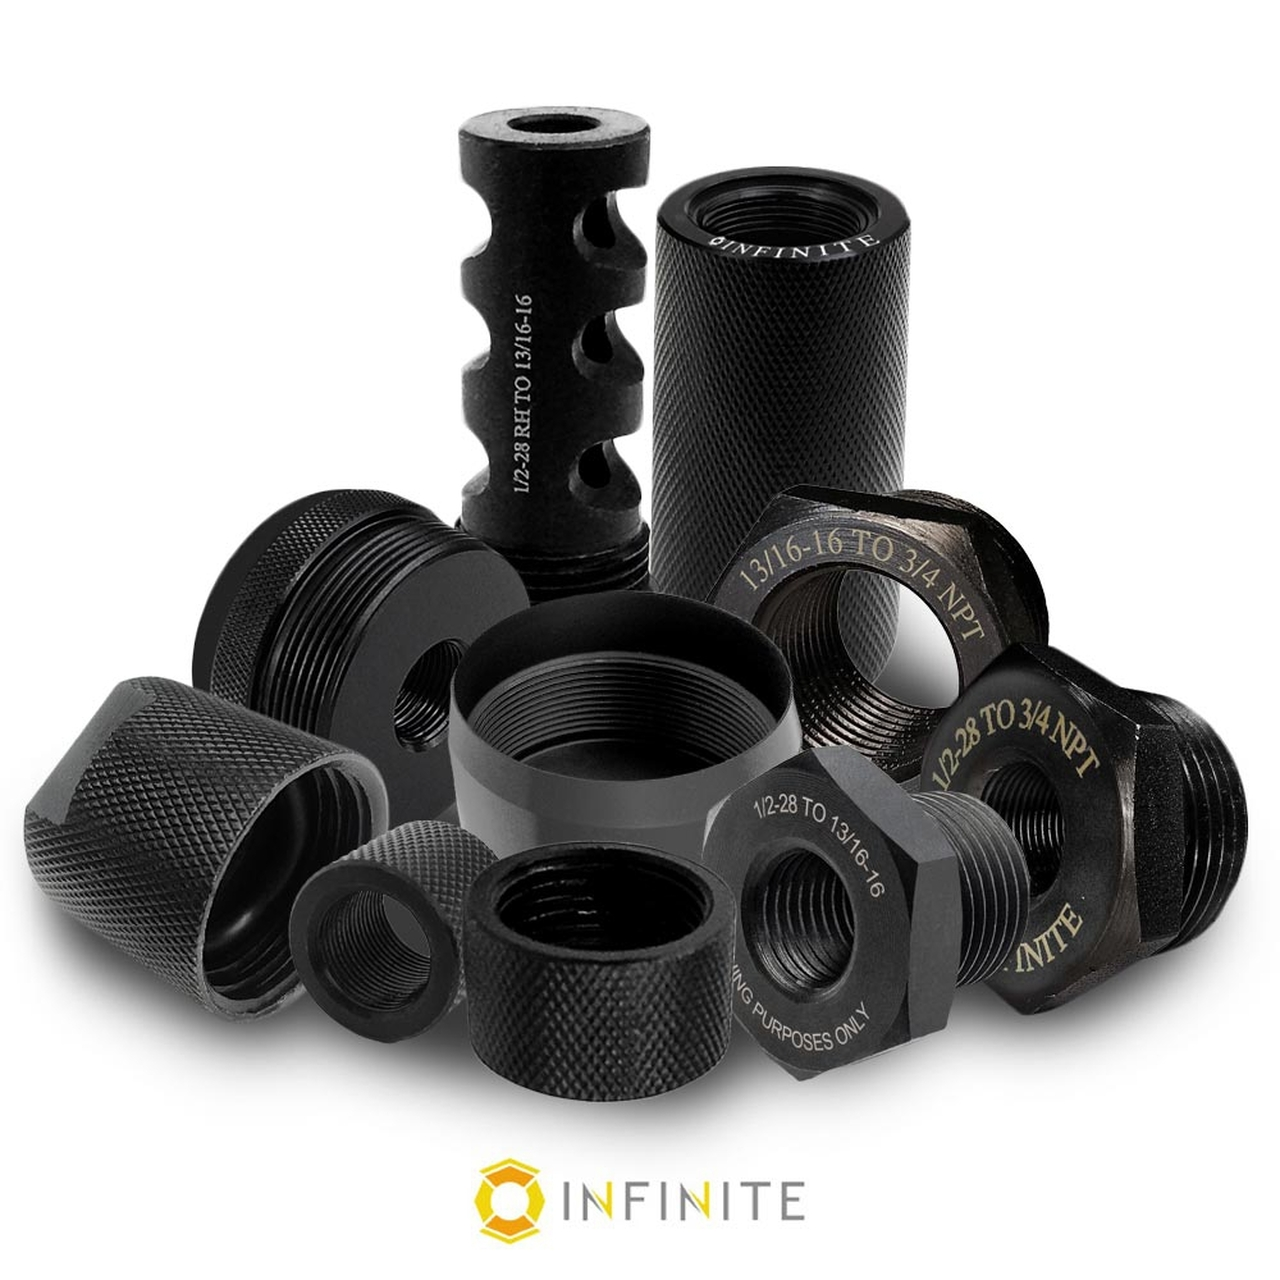 Infinite Combo Kits